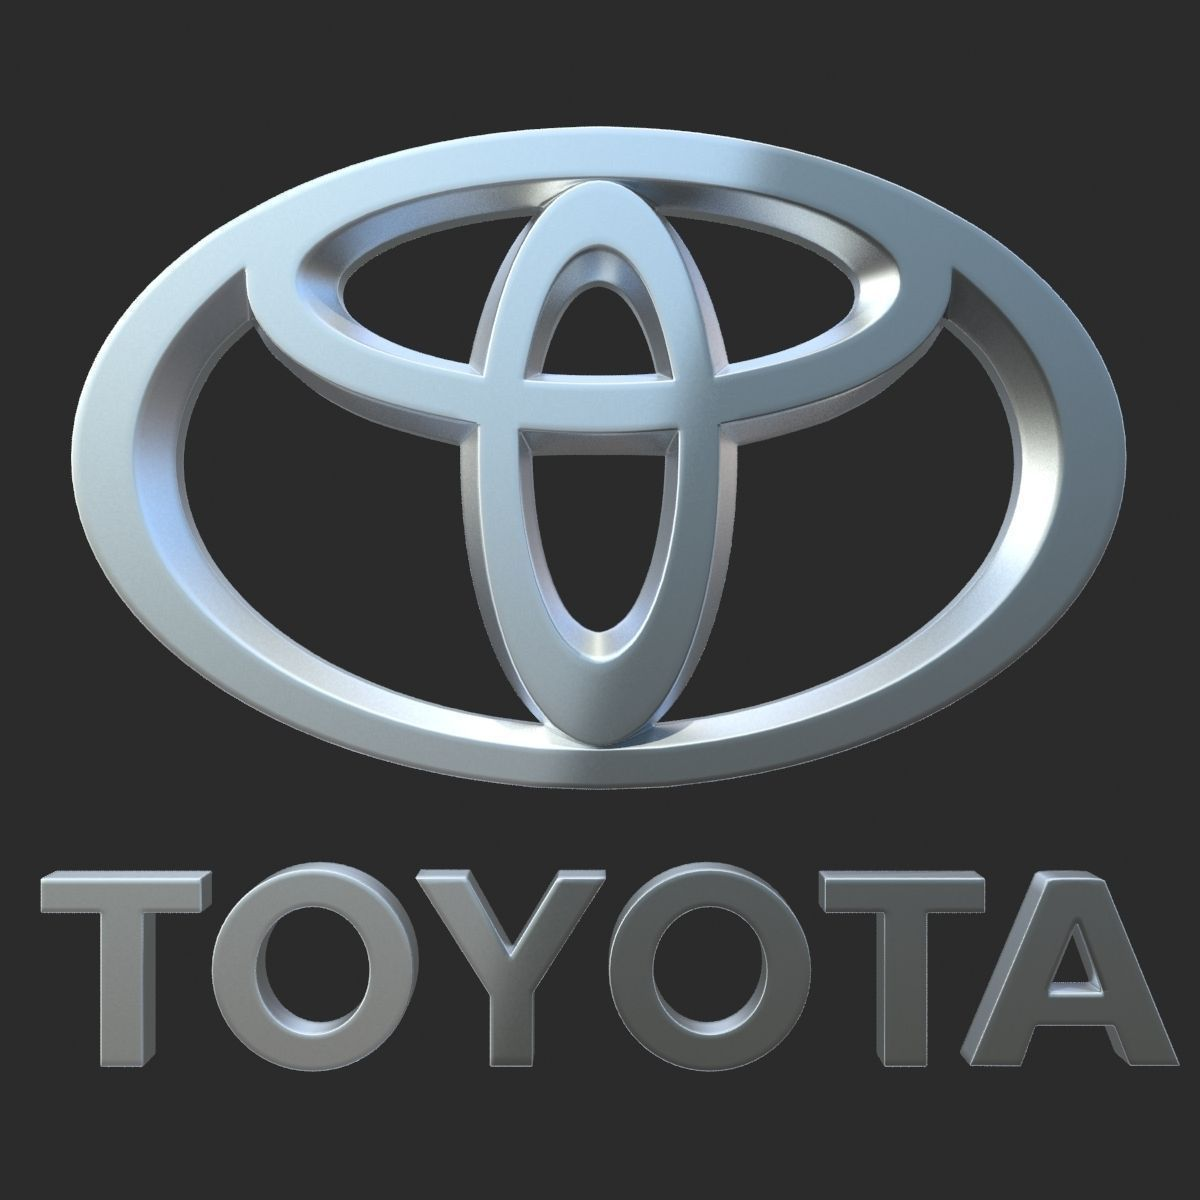 Polygonal House Logo: Toyota Logo 3D Model .max .obj .3ds .fbx